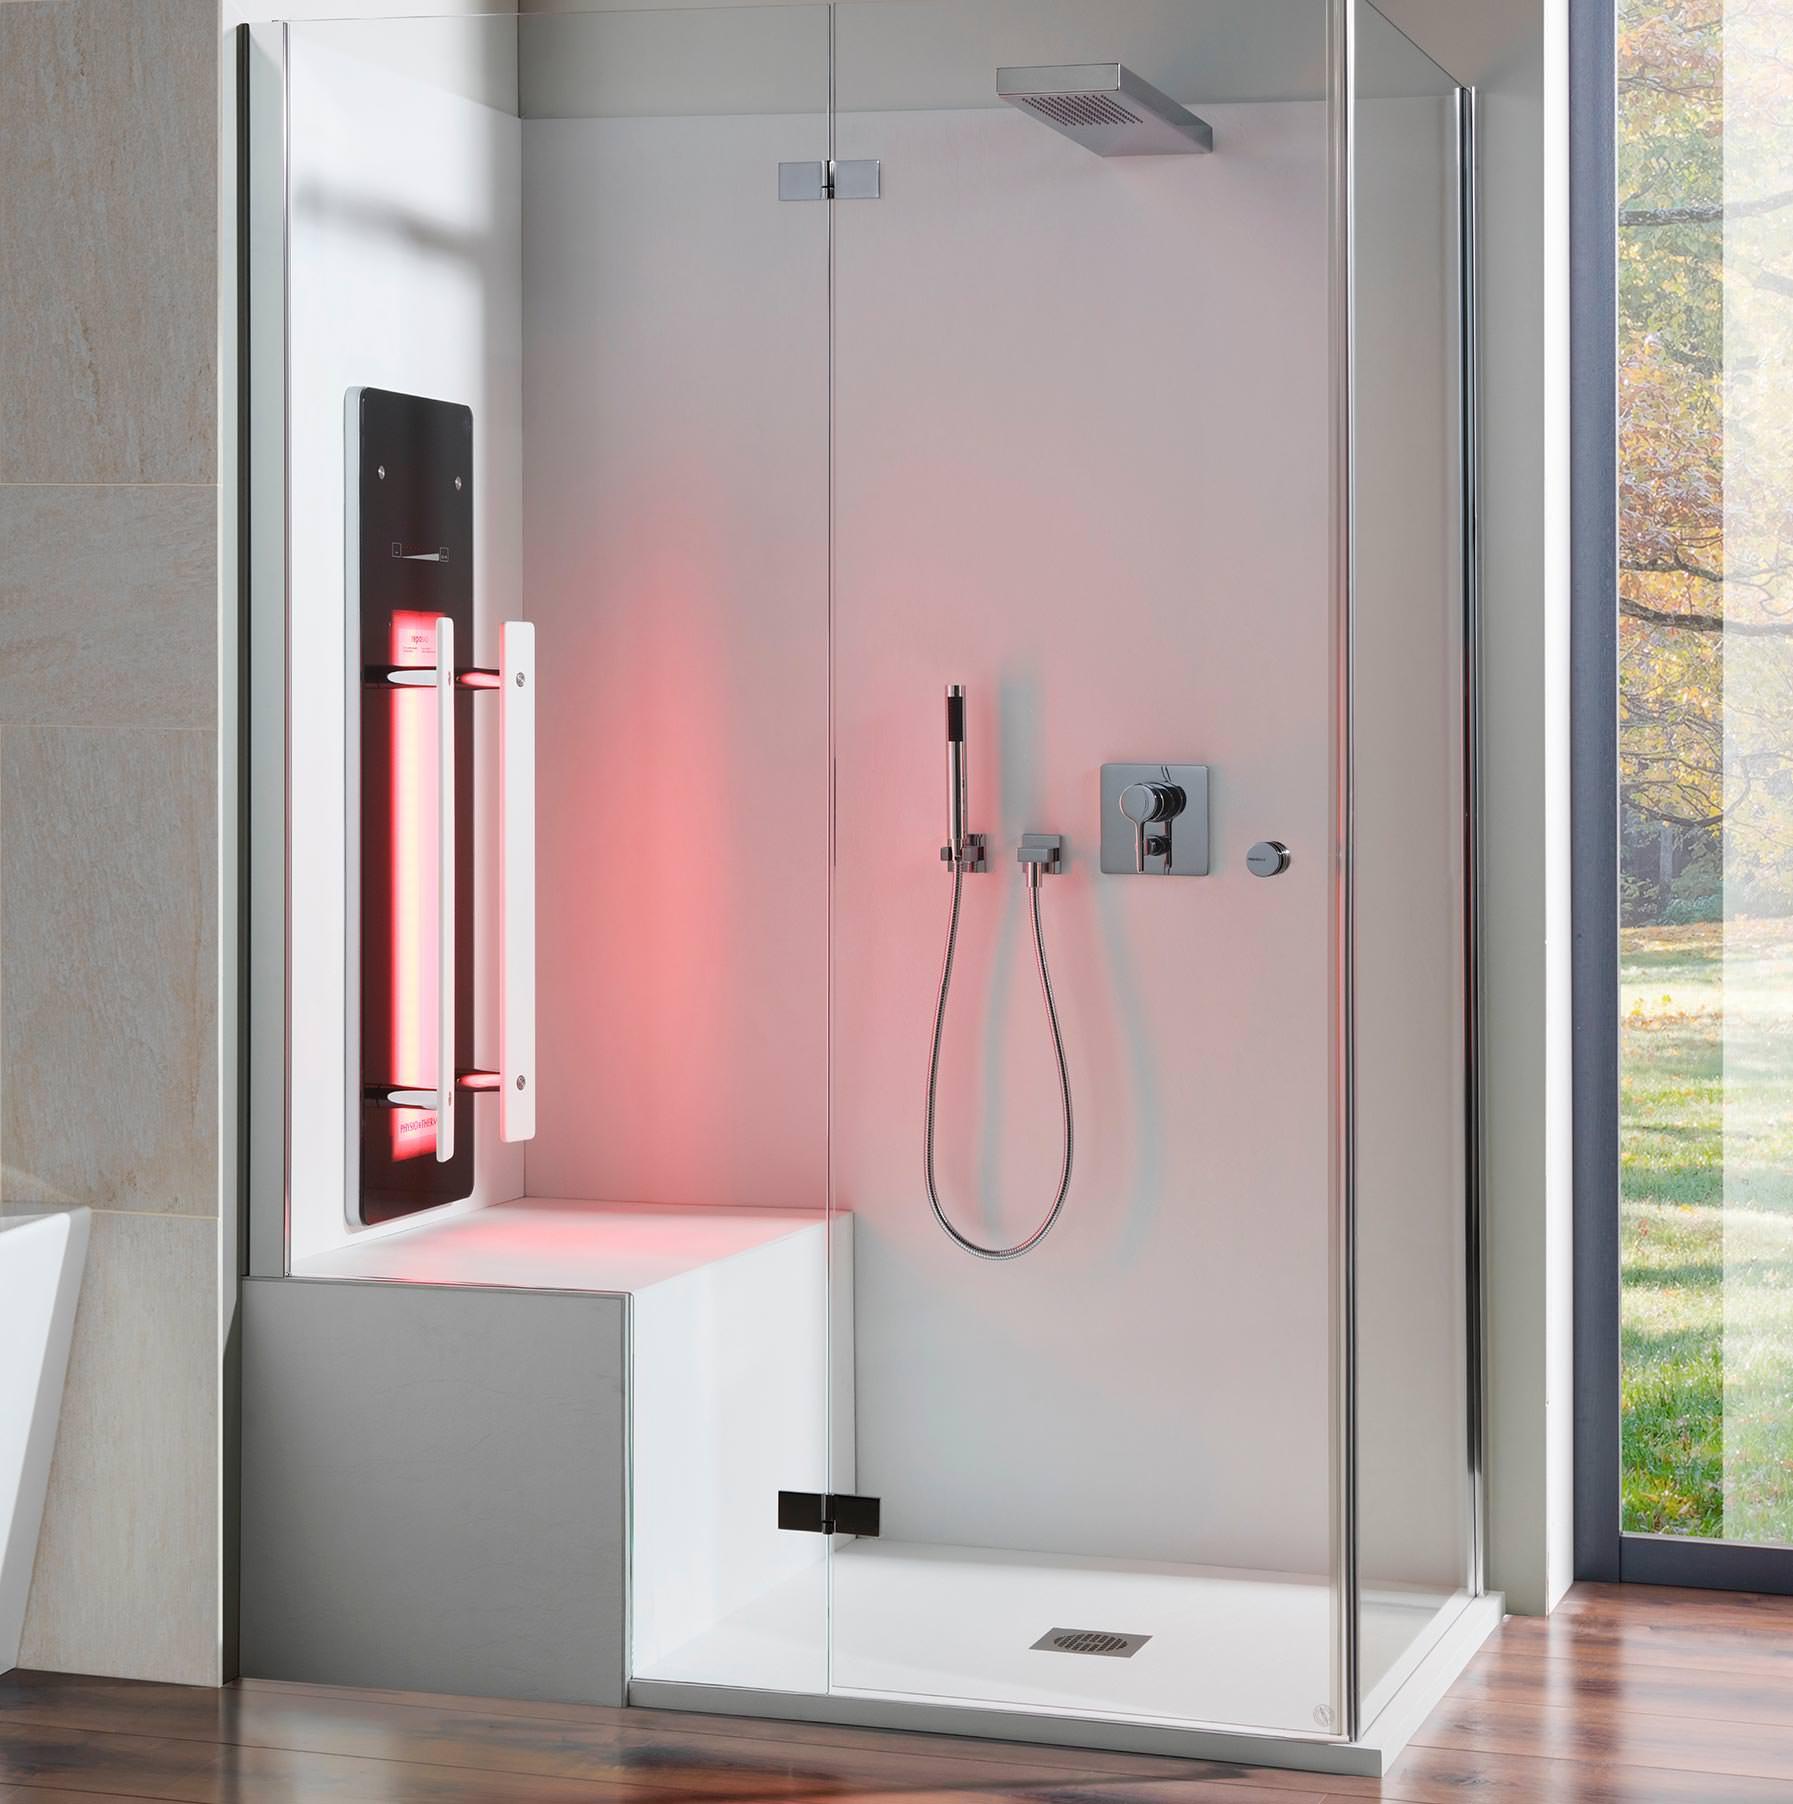 bilbao macht aus duschen infrarotoasen. Black Bedroom Furniture Sets. Home Design Ideas